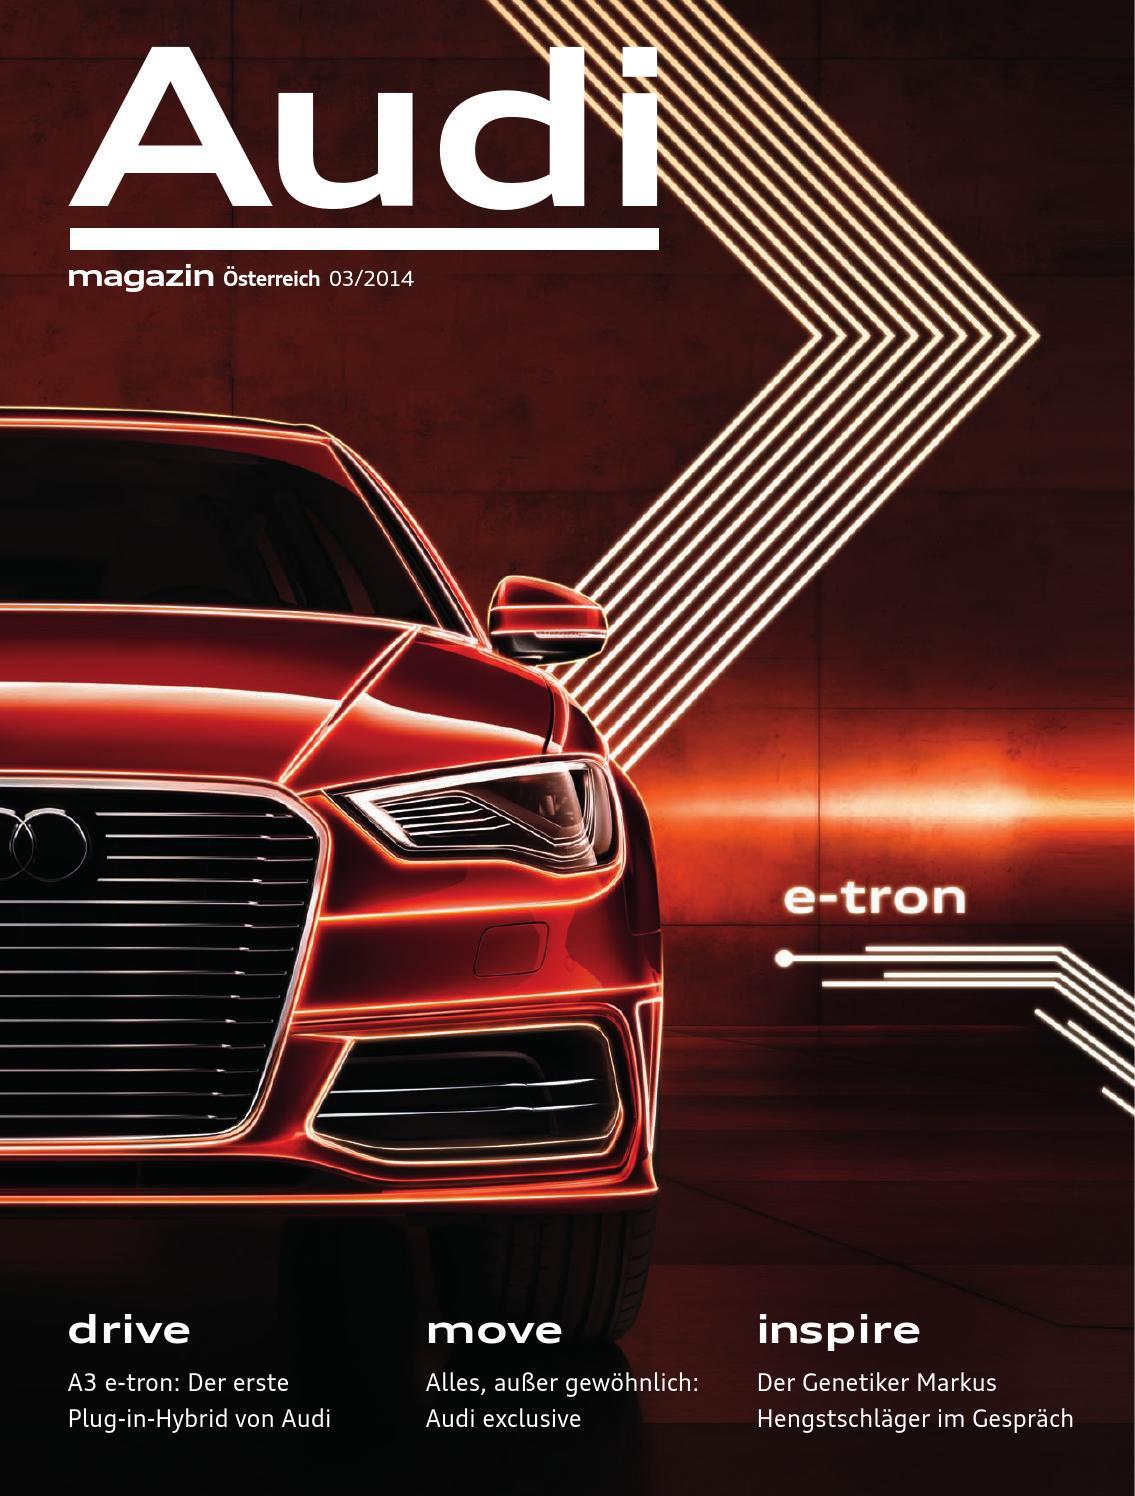 Issuu Audi Magazin 03 2014 By Agentur Loop New Media Gmbh